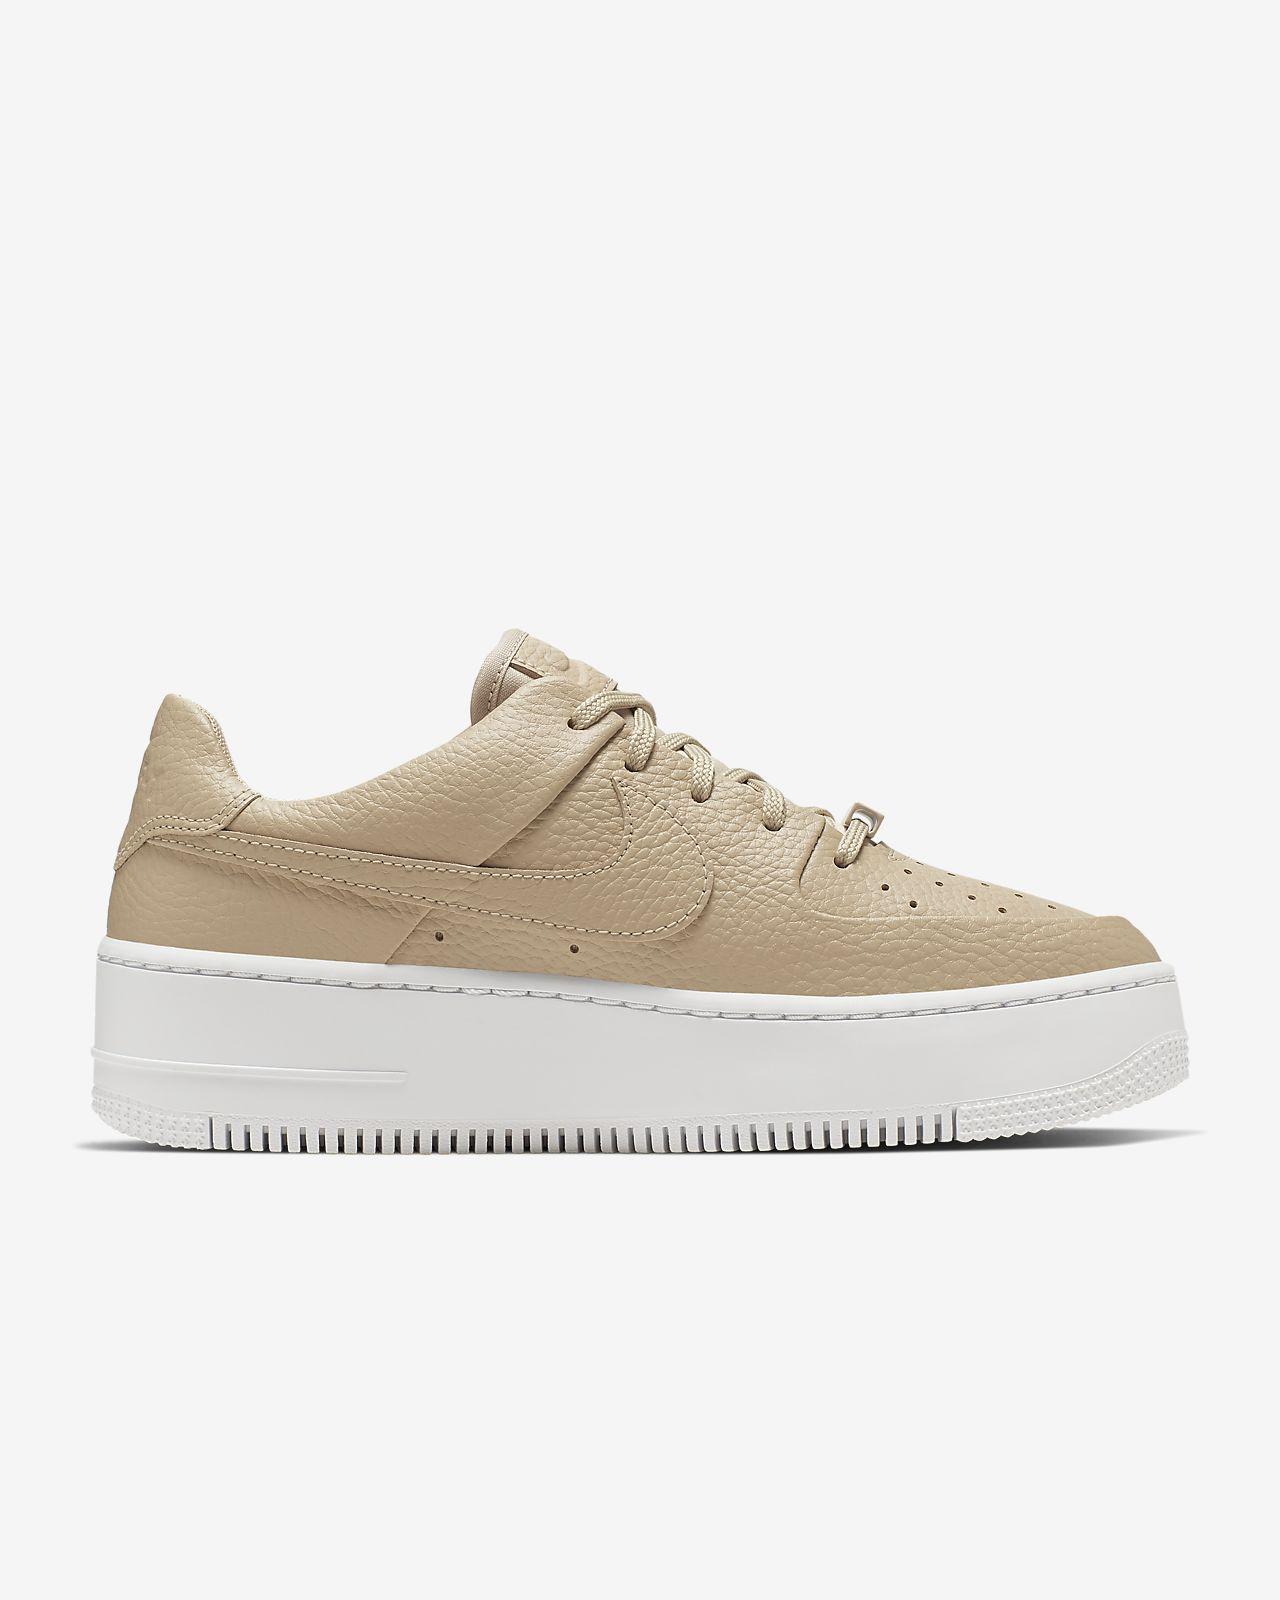 Nike Air Force 1 Sage Low 2 Desert Ore